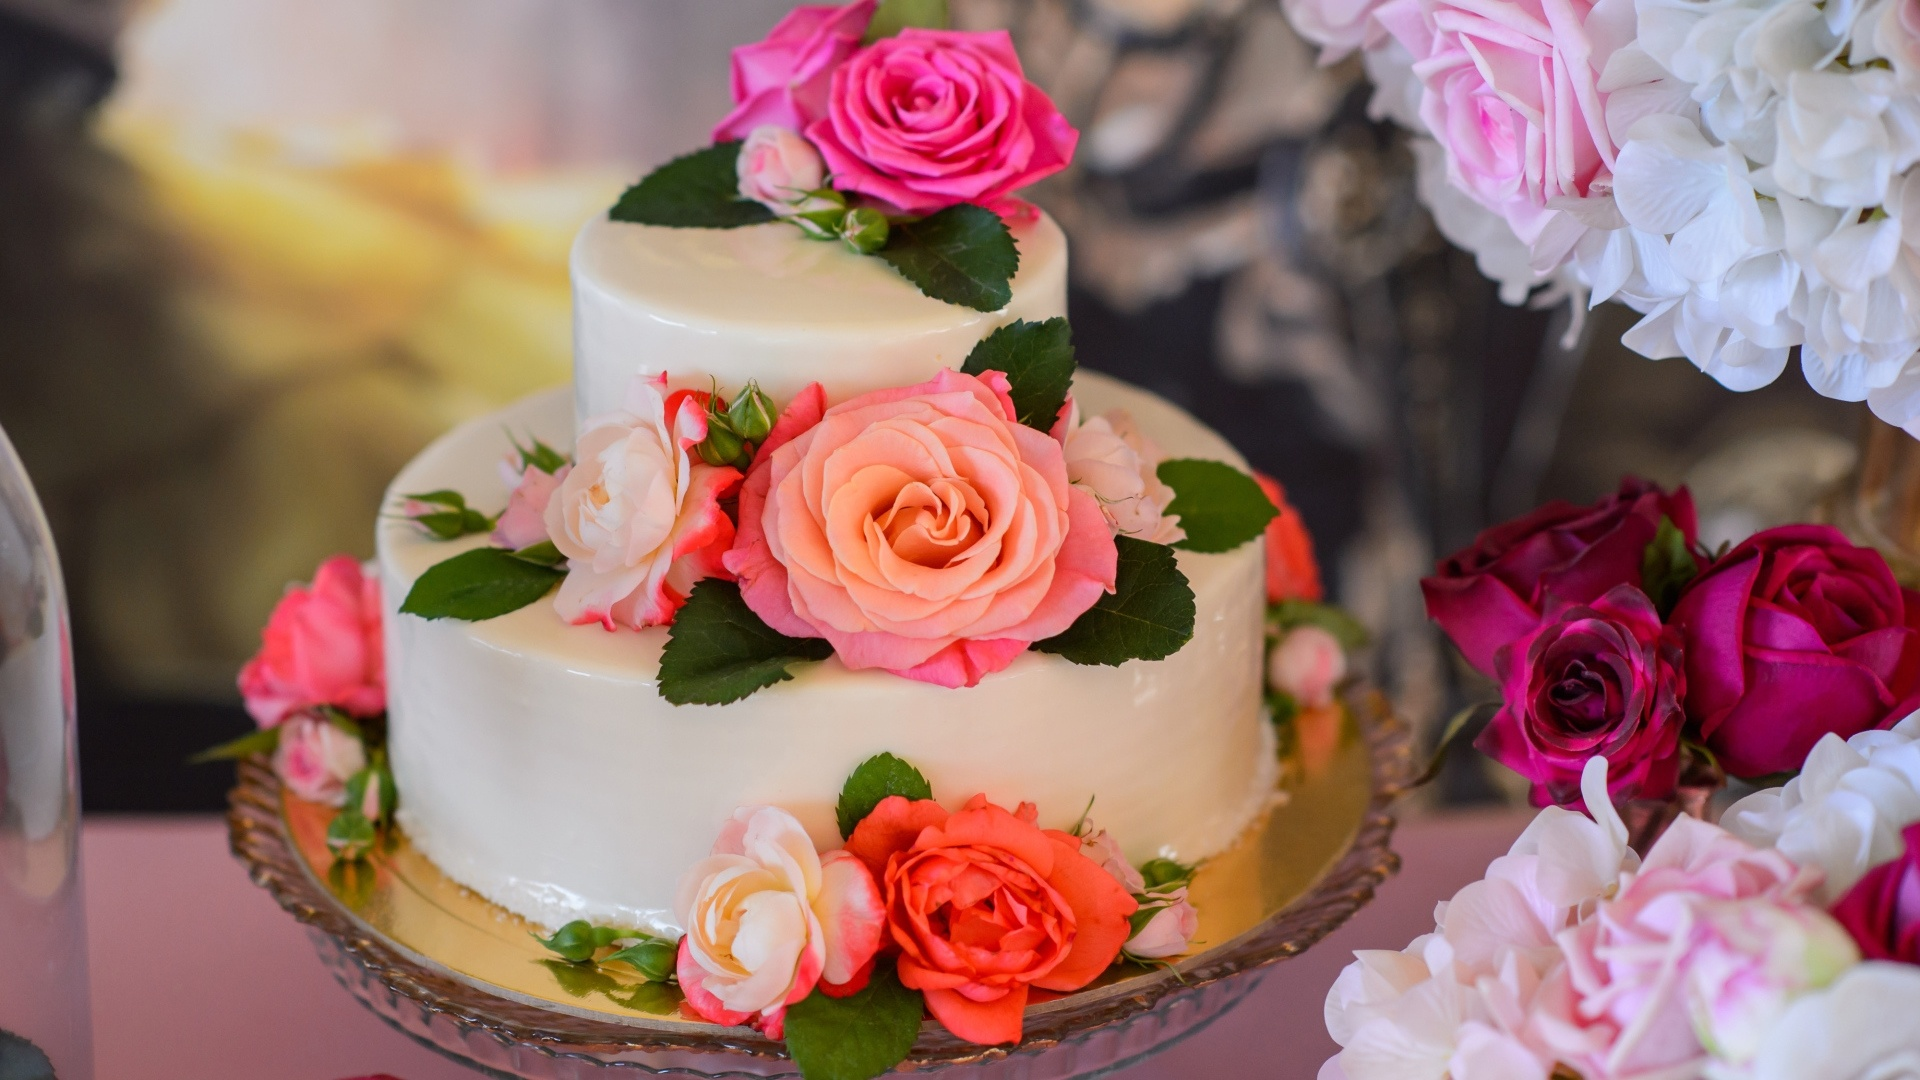 Wedding Cake wallpaper for computer